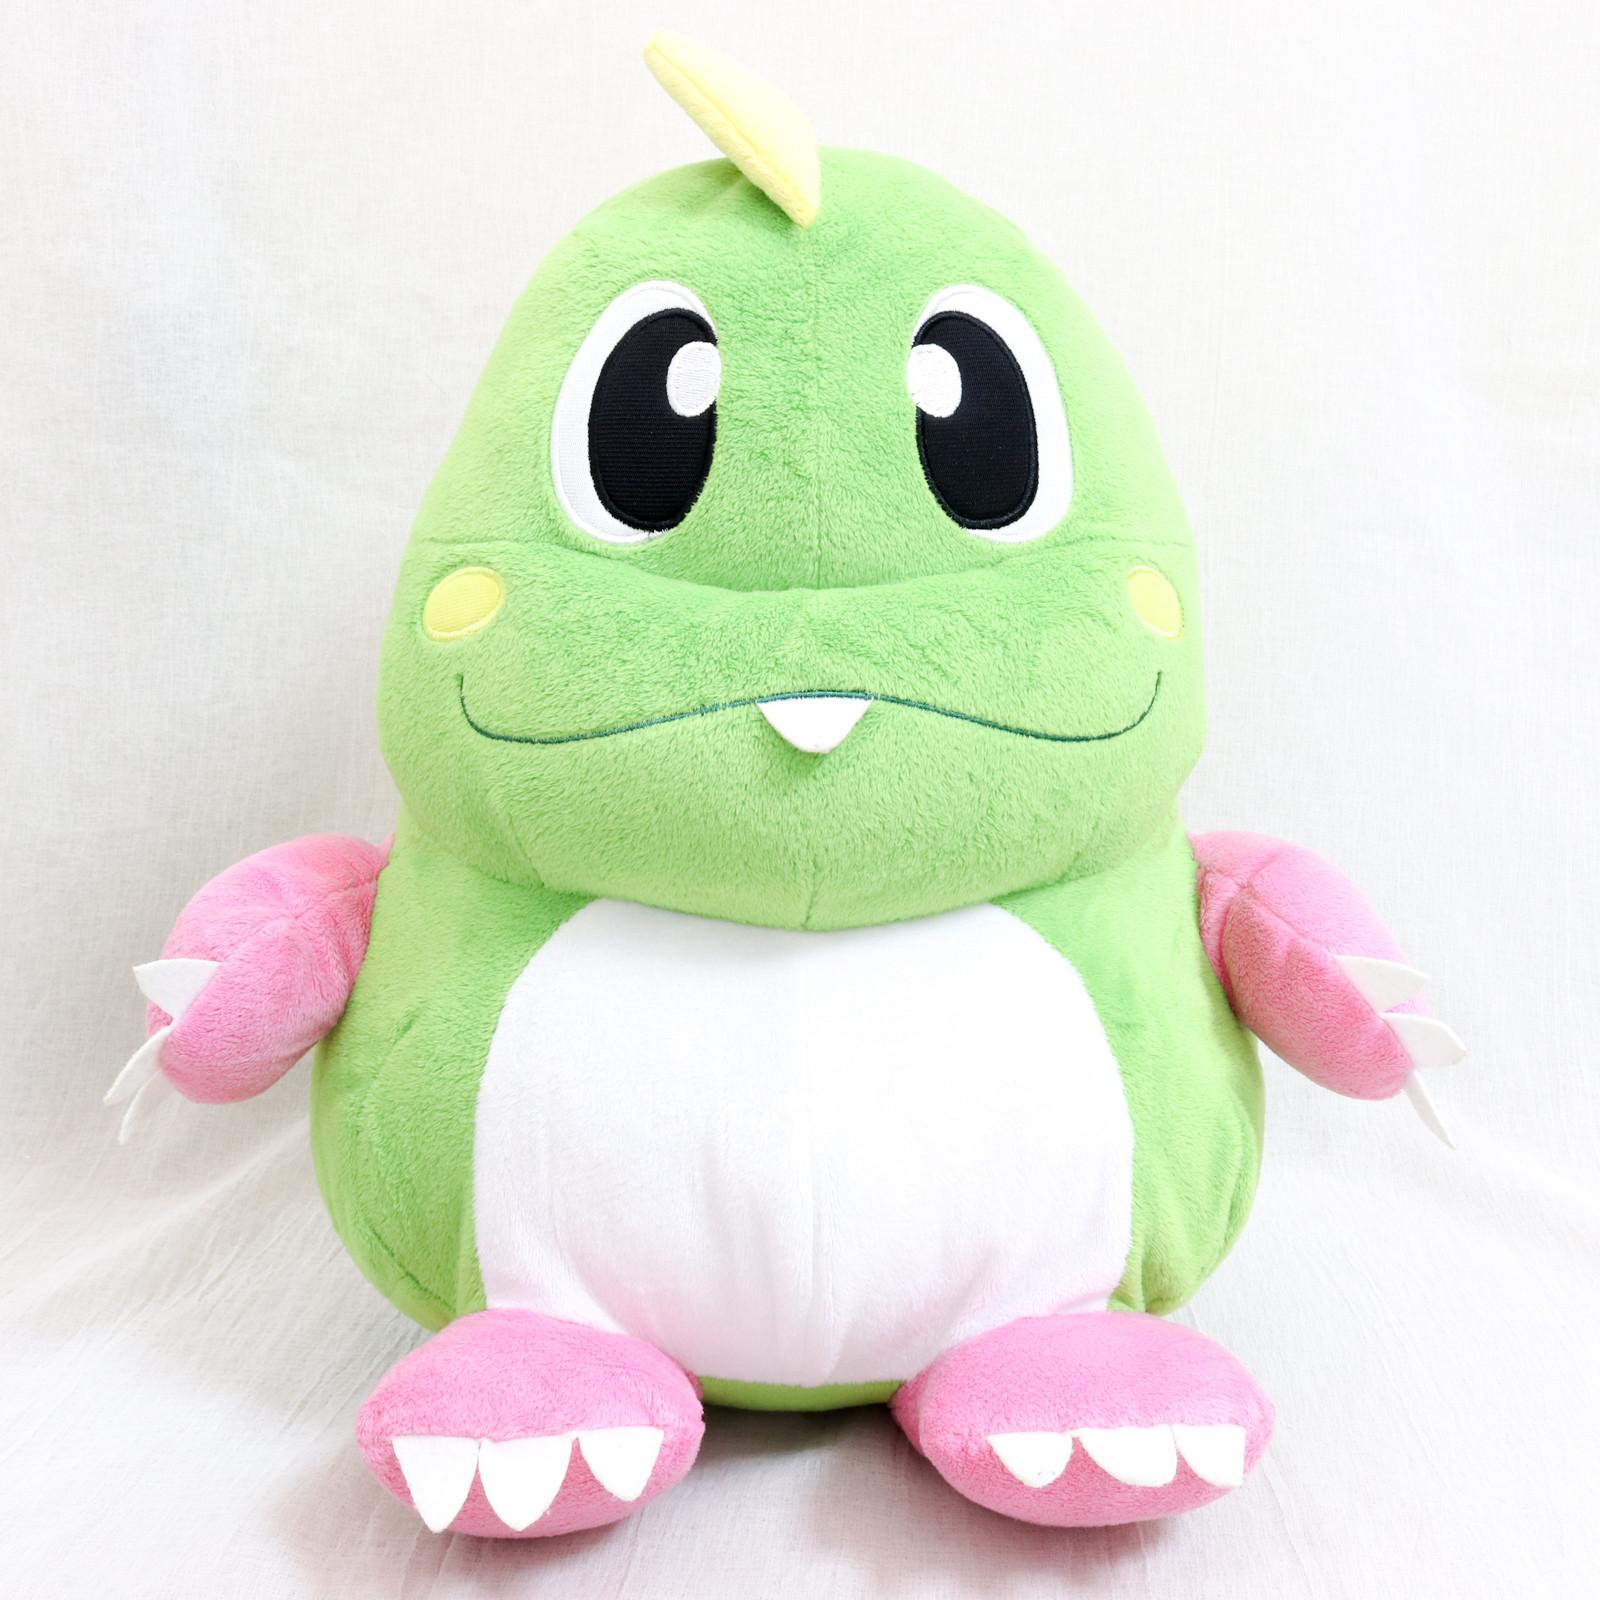 "Bubble Bobble Bub Bubblun Dragon 14"" XL Size Plush Doll Taito JAPAN GAME NES"